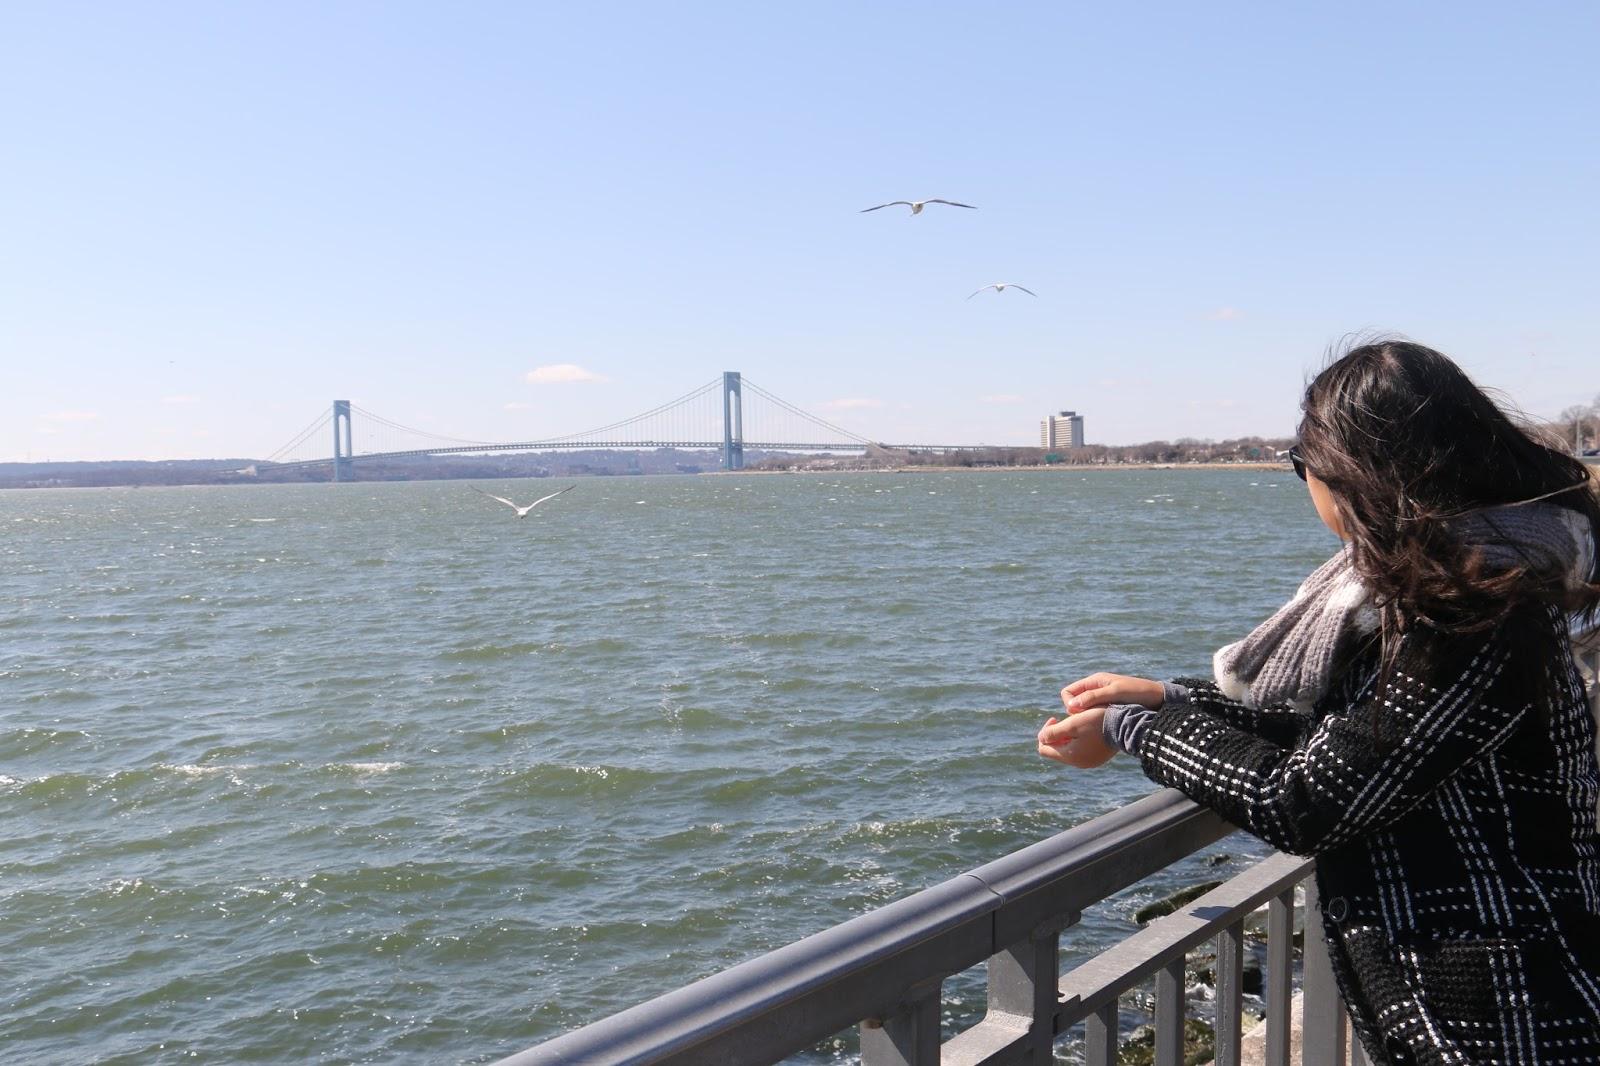 Brooklyn, travel, new york city, outfit, beach